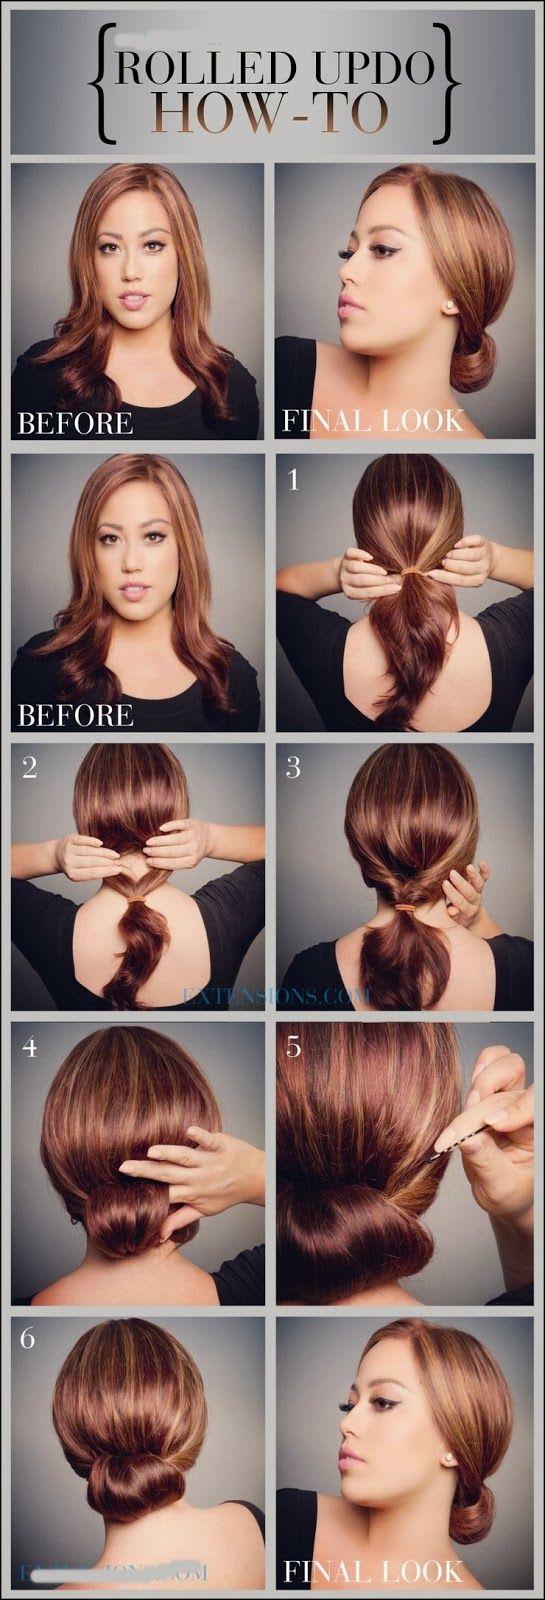 Roll Up Hair